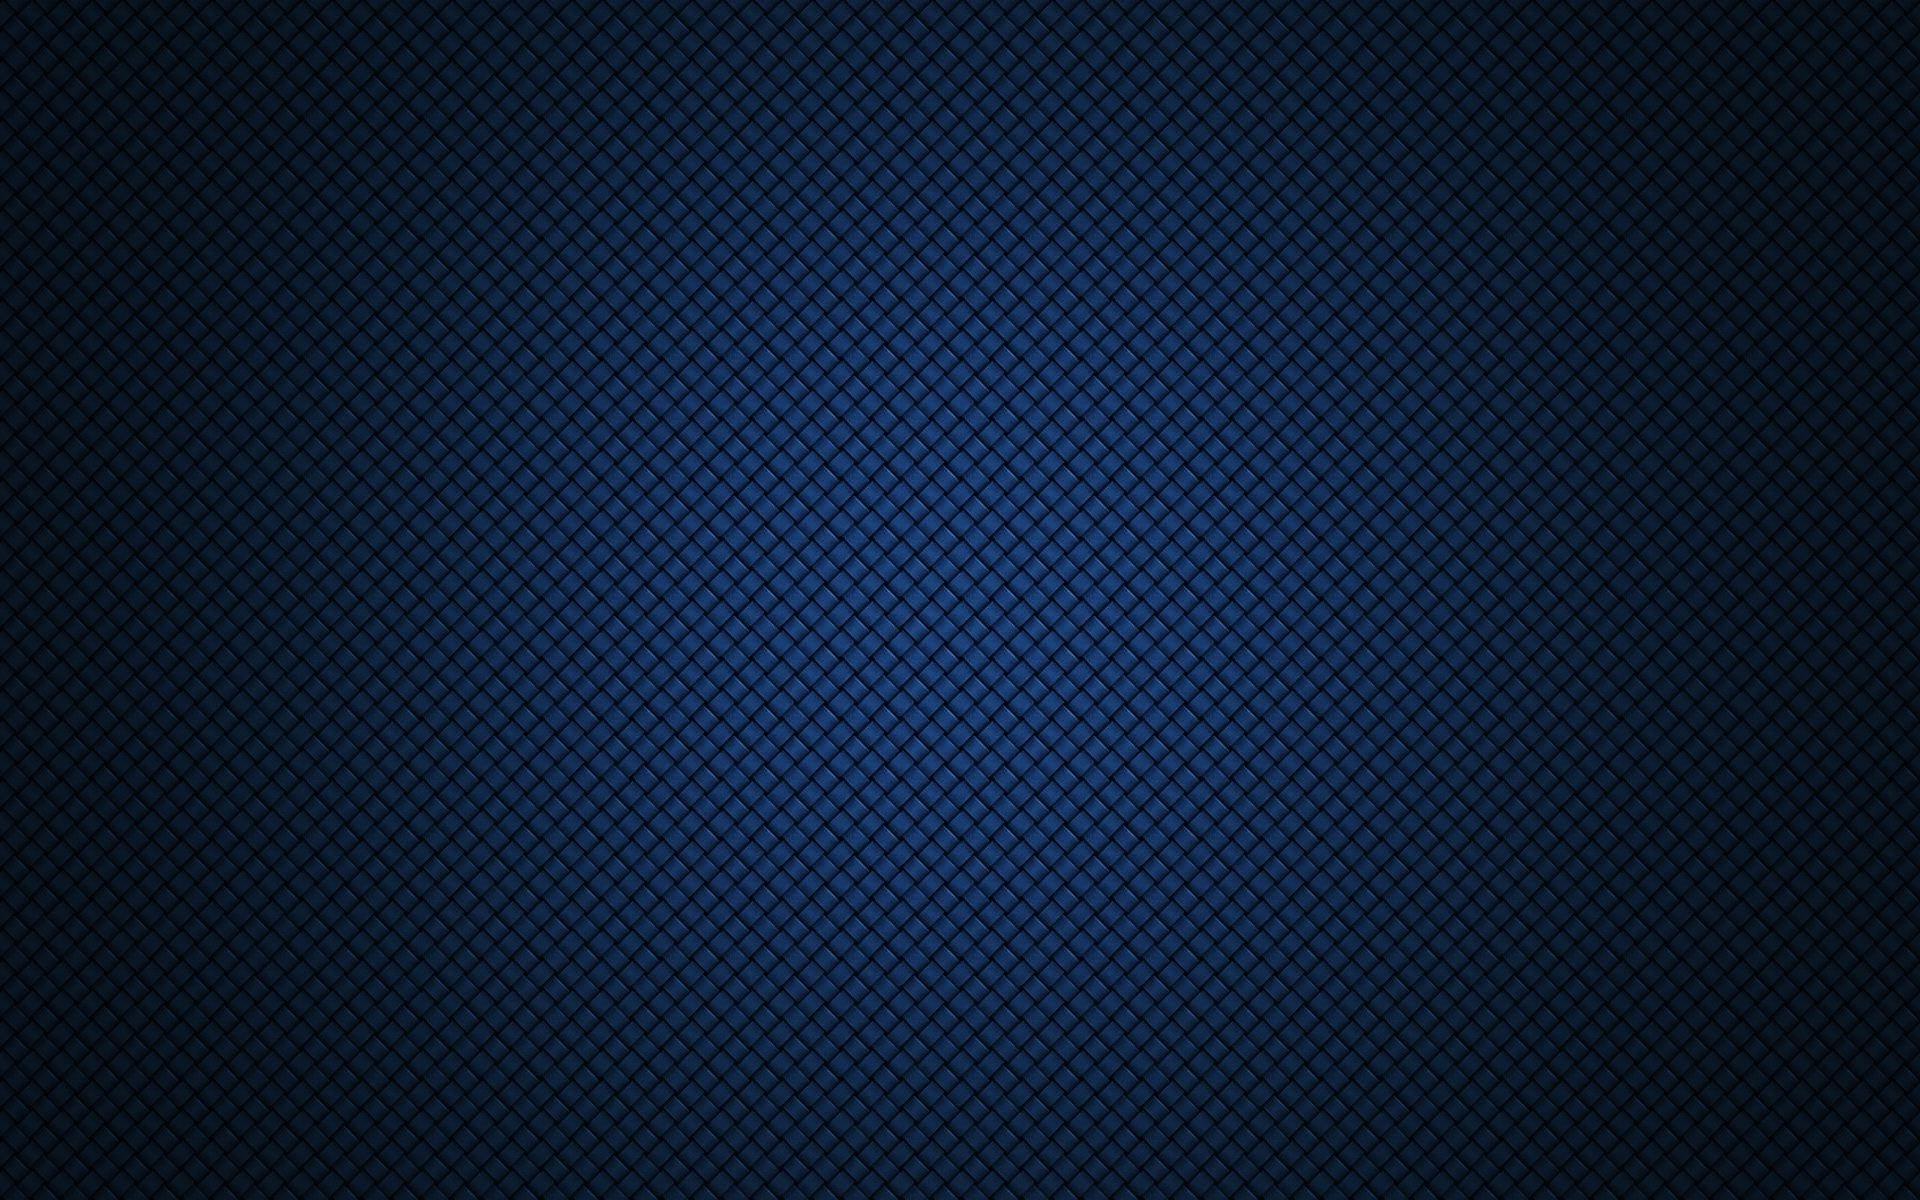 1920x1200 Dark Blue Checks Plain HD Wallpapers